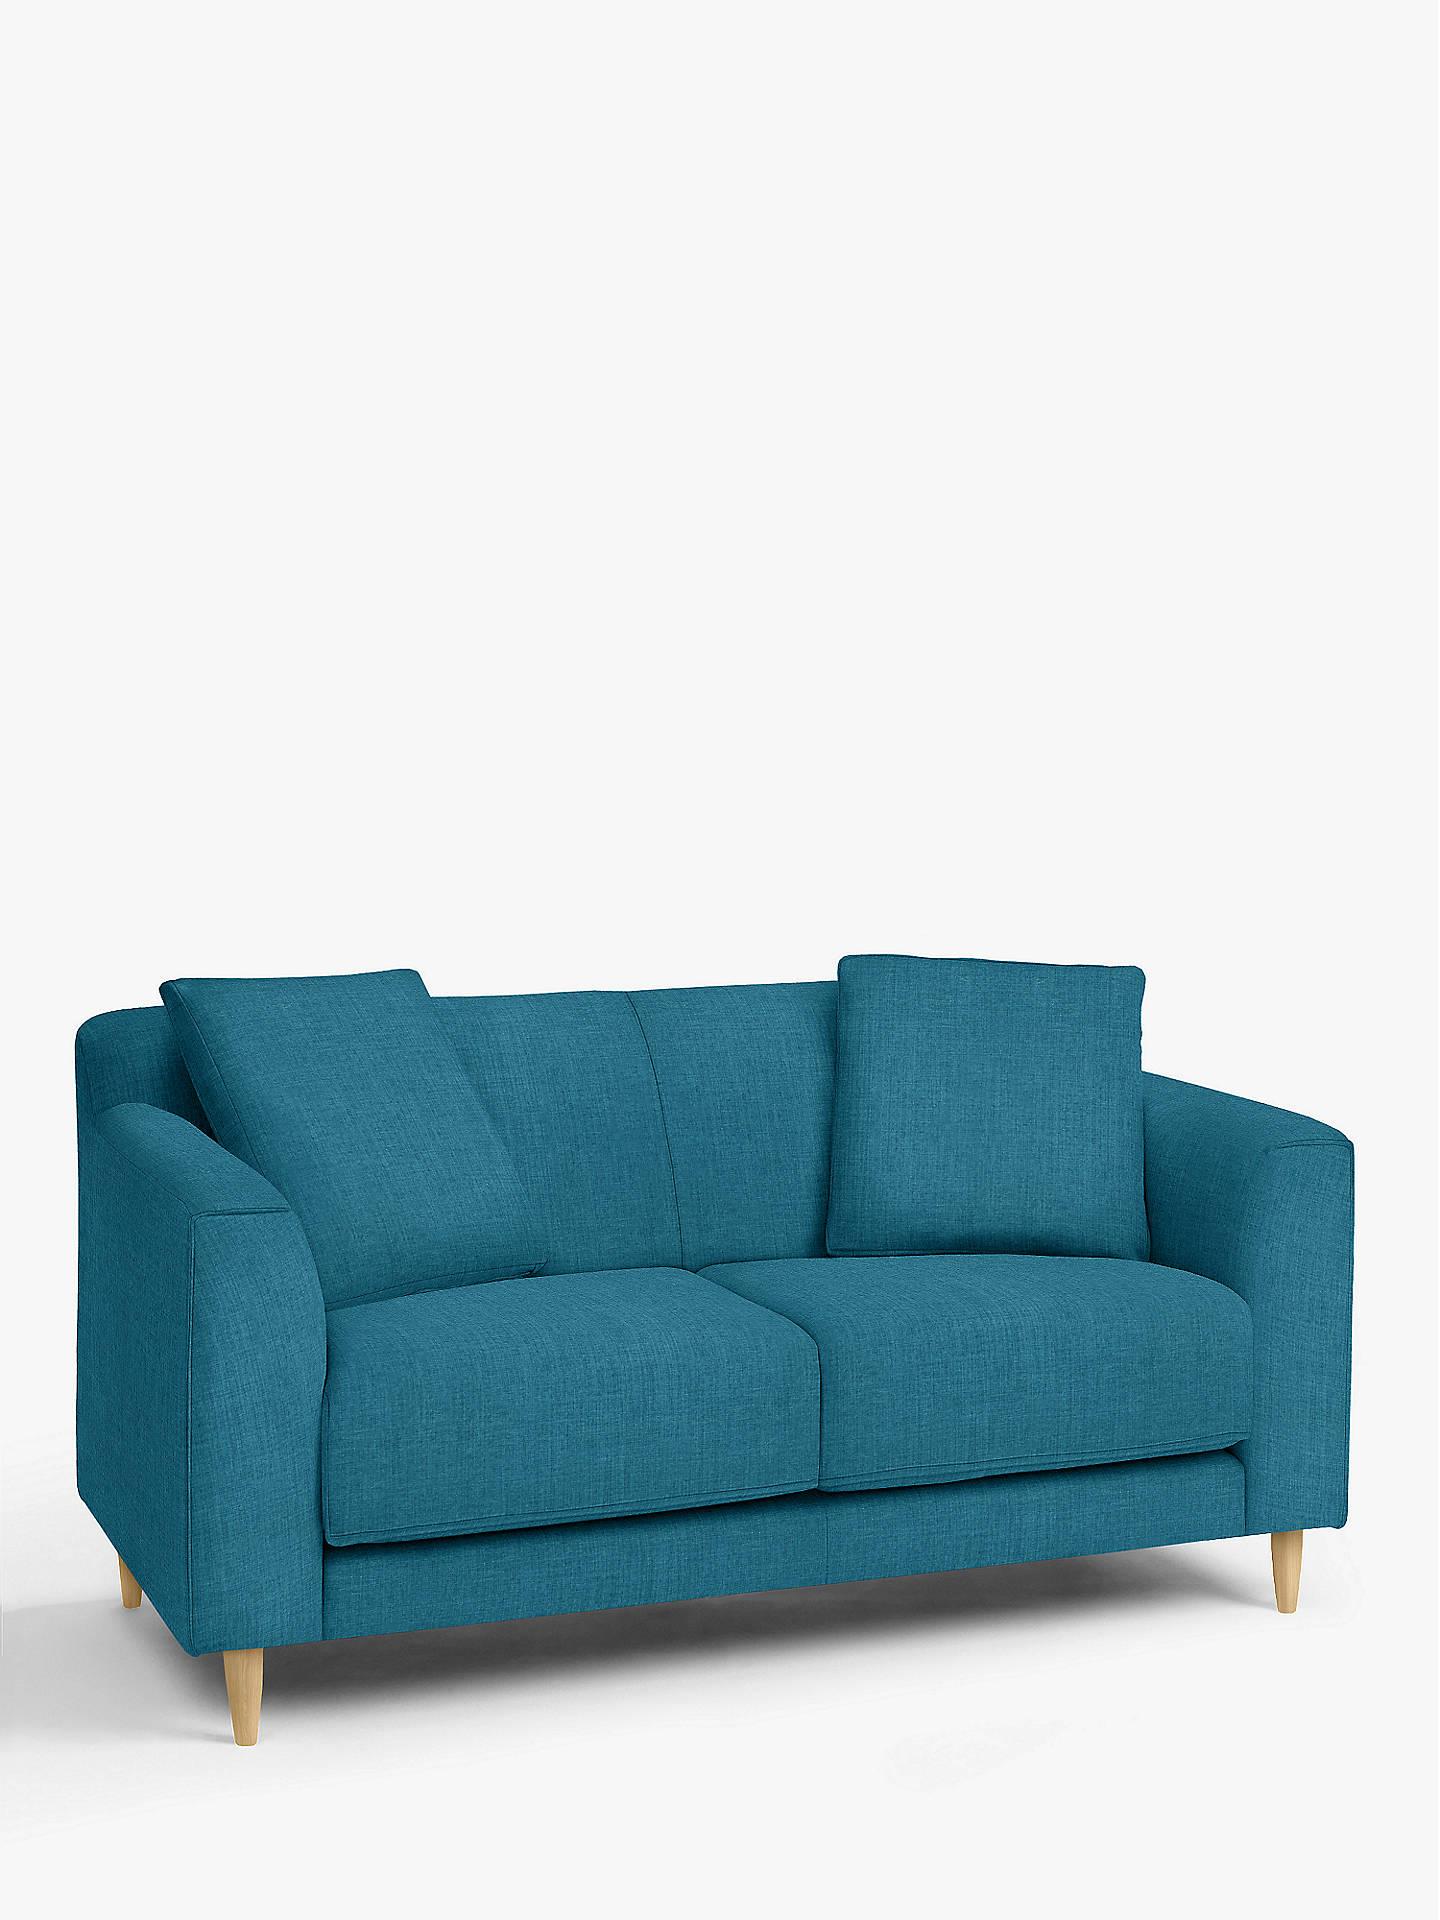 Groovy John Lewis Partners Billow Small 2 Seater Sofa Light Leg Hatton Teal Theyellowbook Wood Chair Design Ideas Theyellowbookinfo